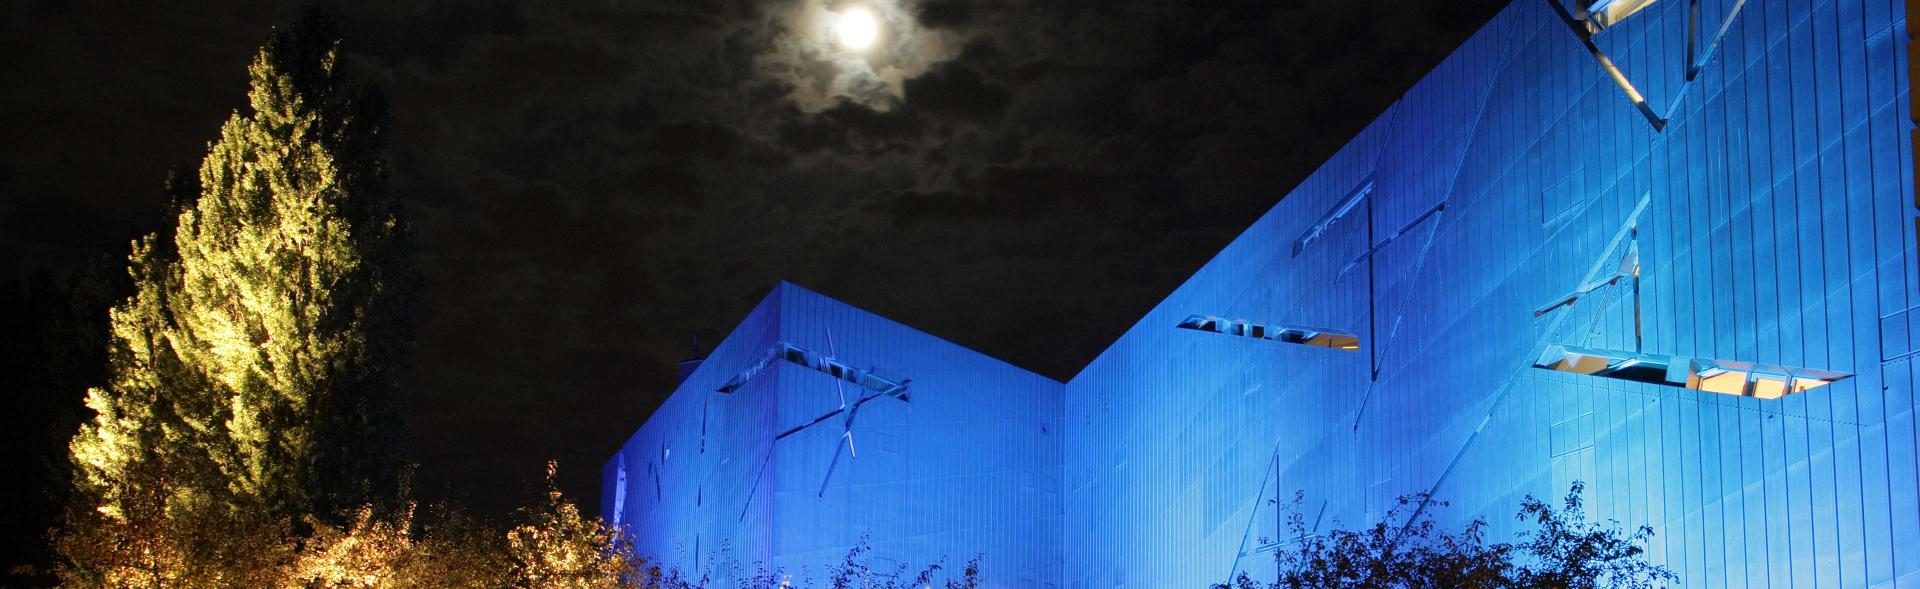 Libeskind-Bau blau angestrahlt, nachts, bei Vollmond